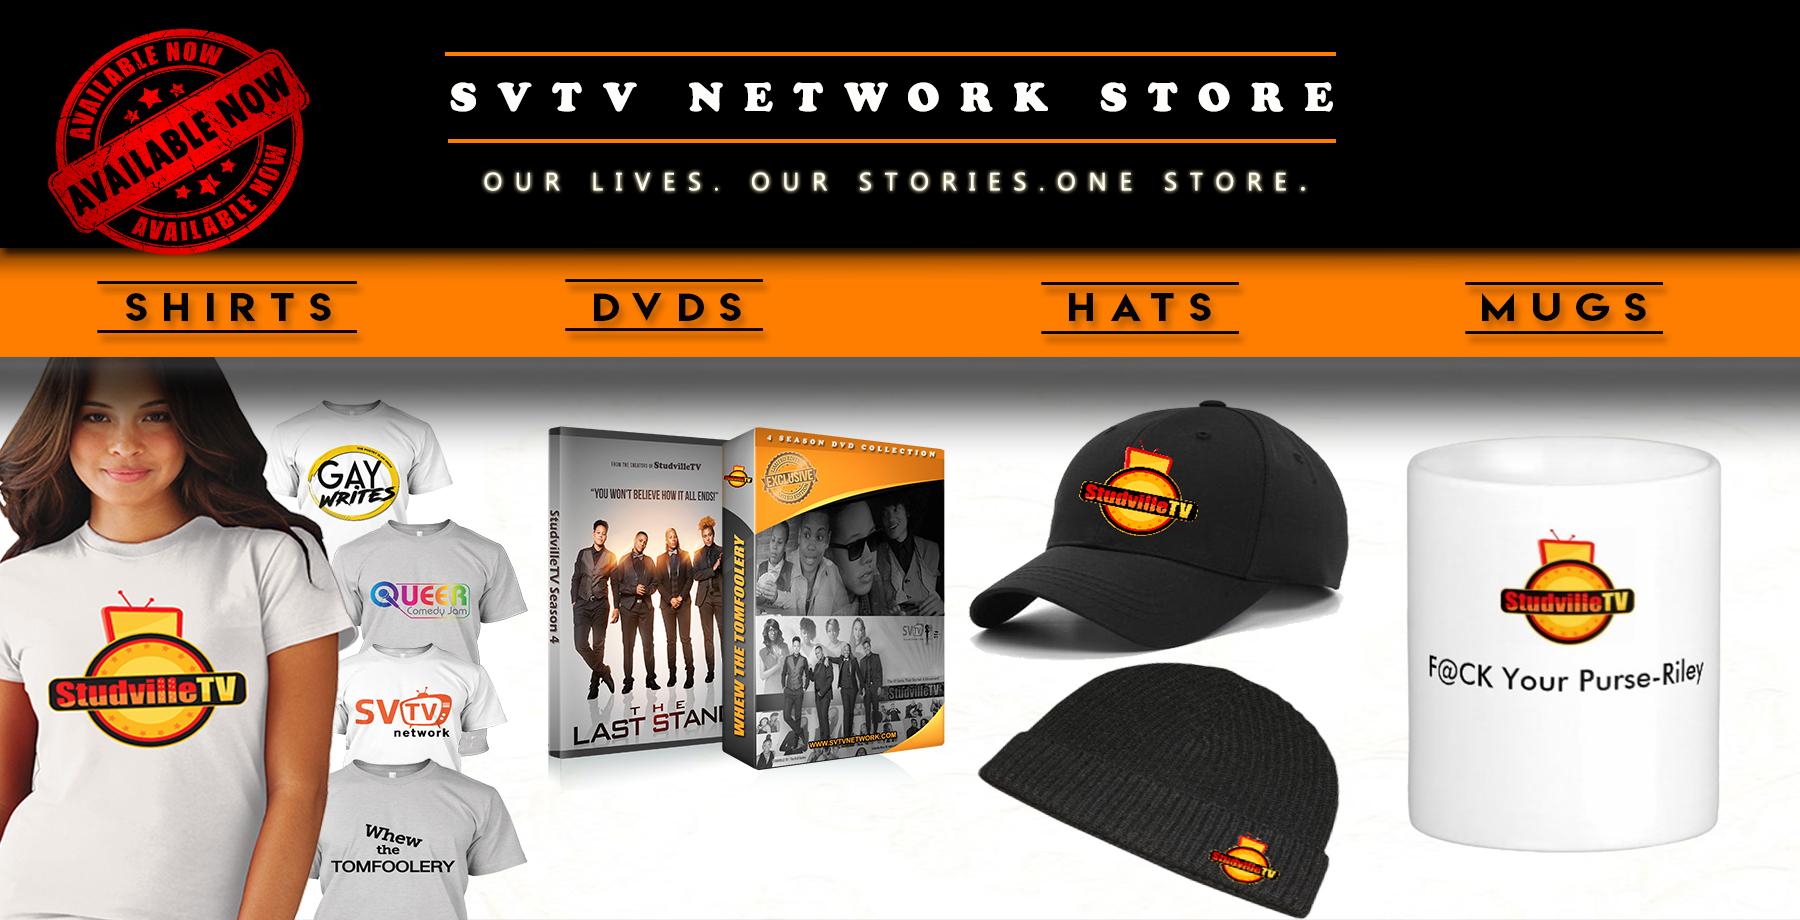 svtv shop